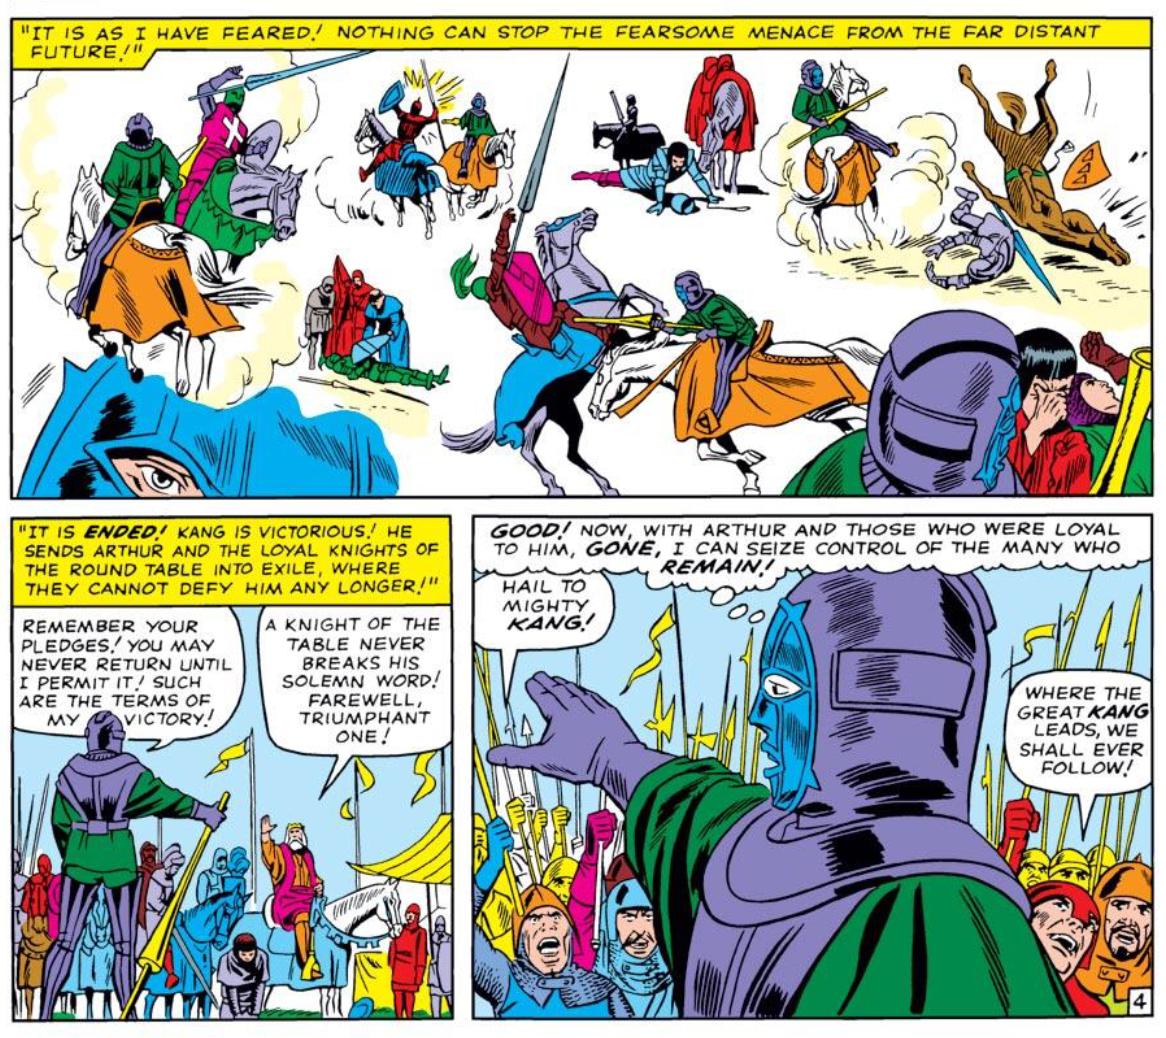 Kang in early Strange Tales Marvel comics